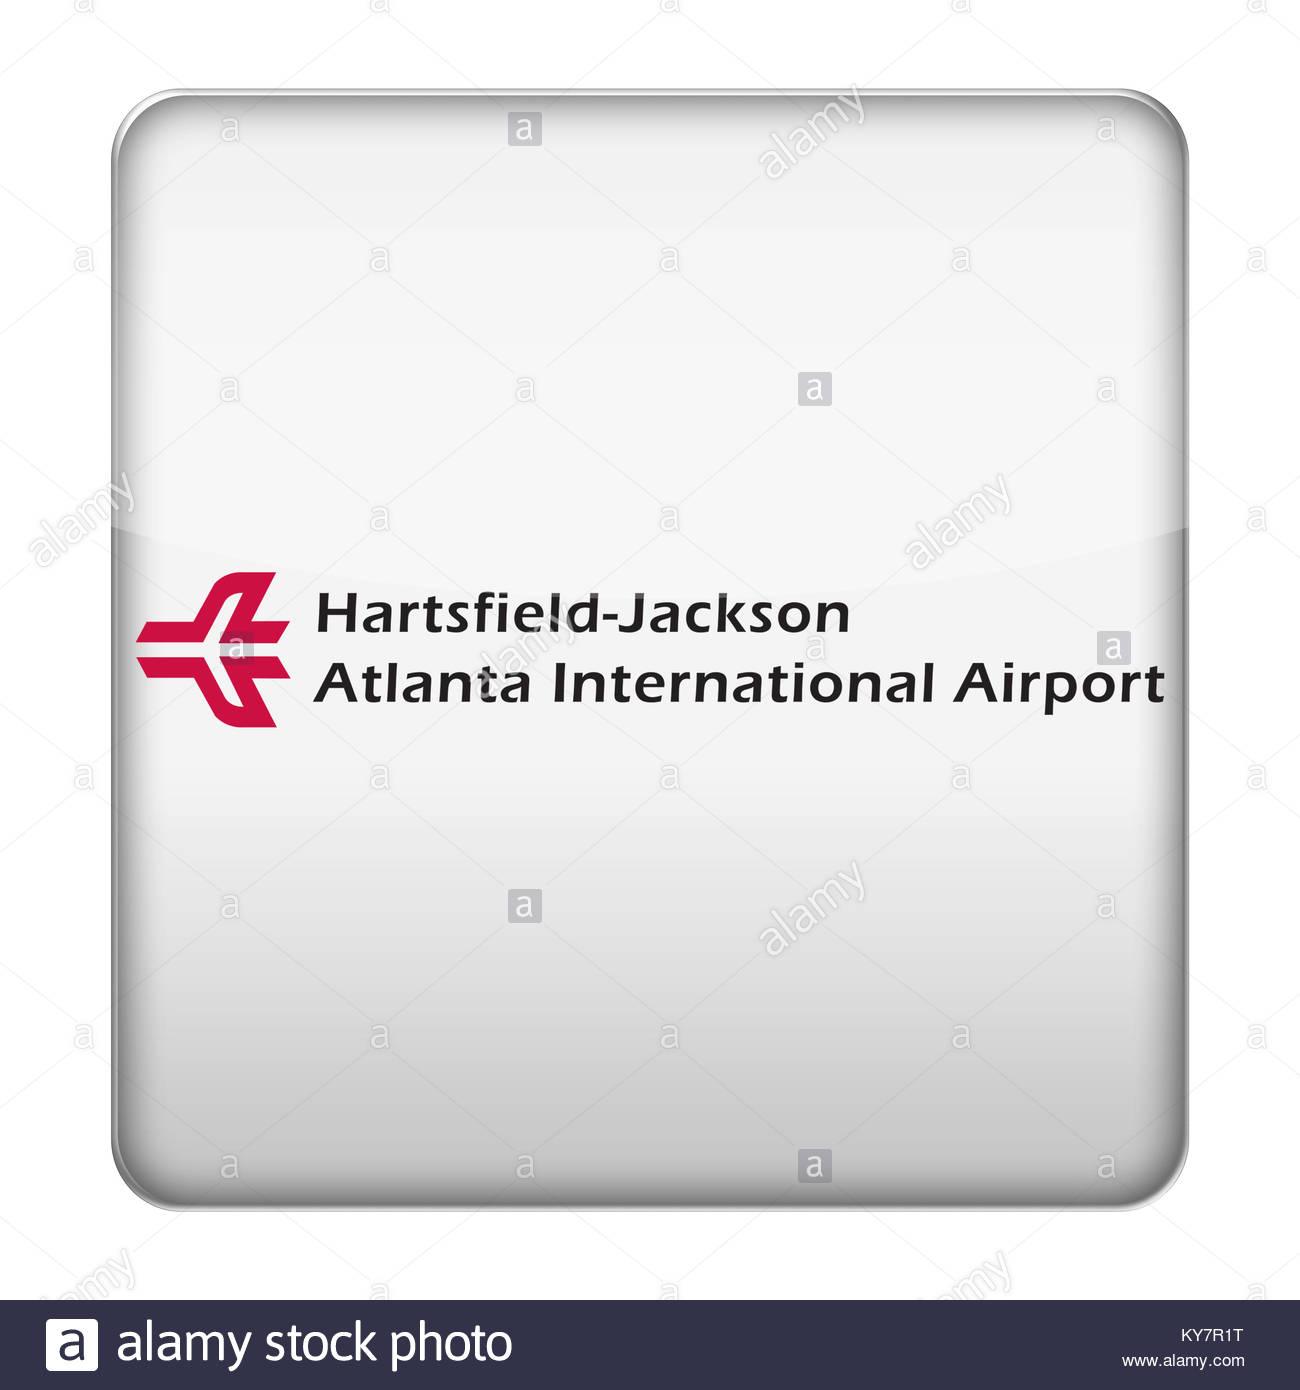 ATL - Hartsfield Jackson Atlanta International Airport icon logo - Stock Image